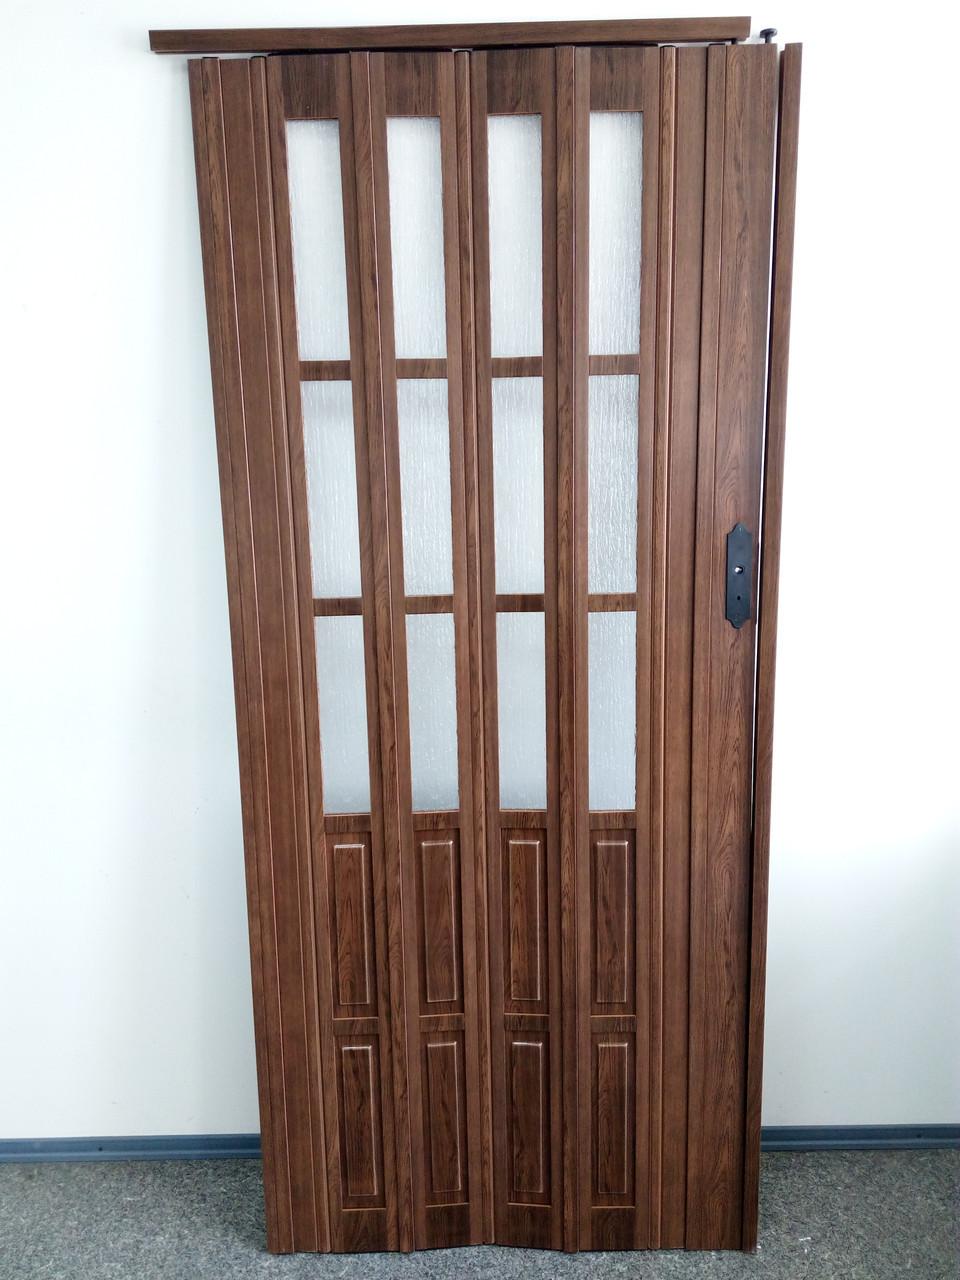 Дверь гармошка межкомнатная полуостекленная, дуб темный 7036, 1020х2030х10мм